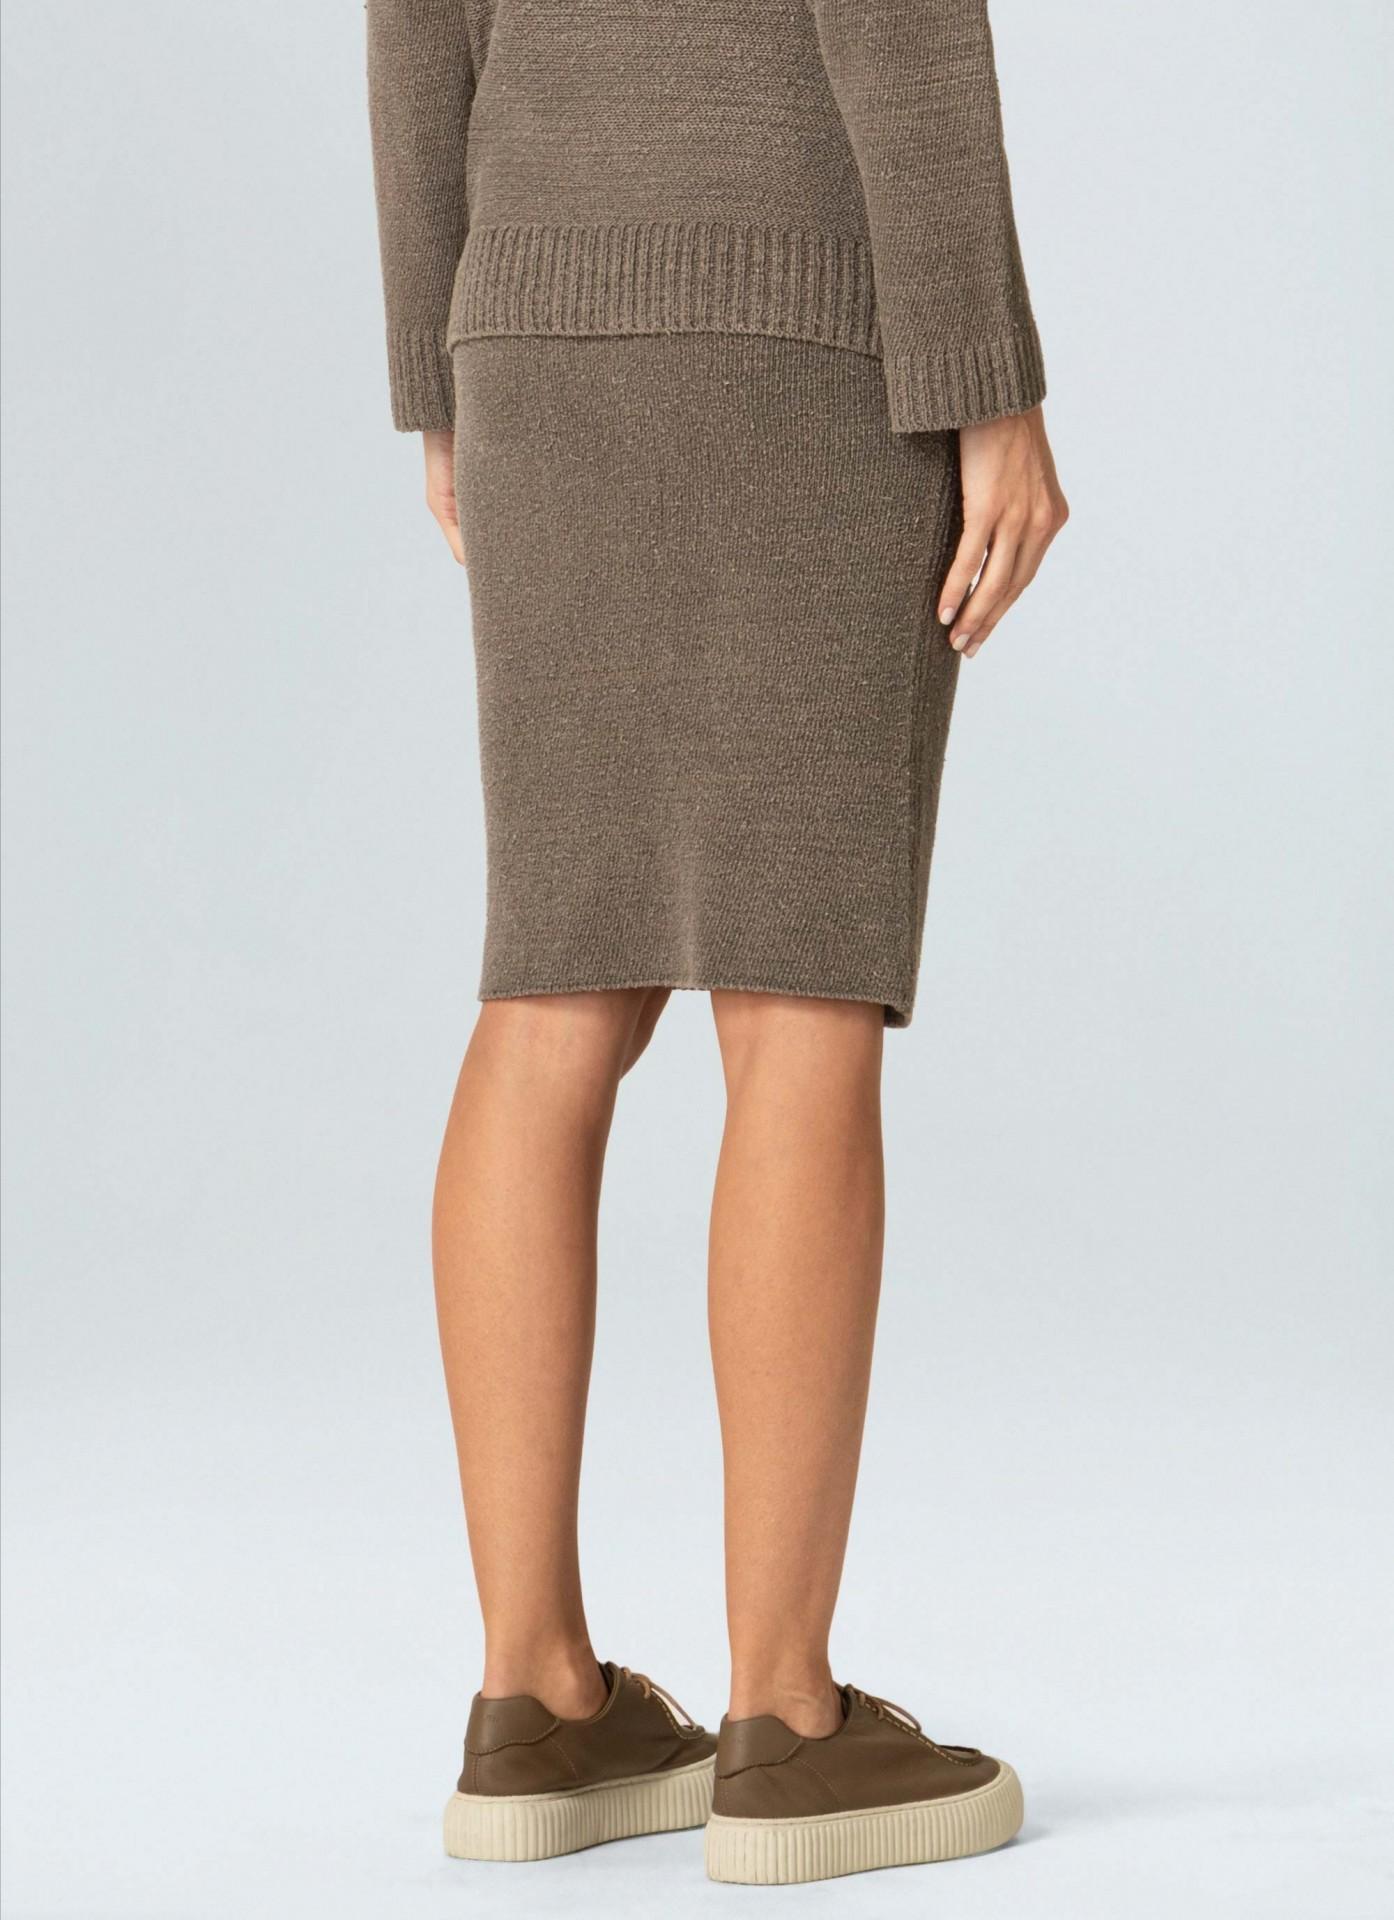 Saia Osklen Knit Cotton E Fabrics